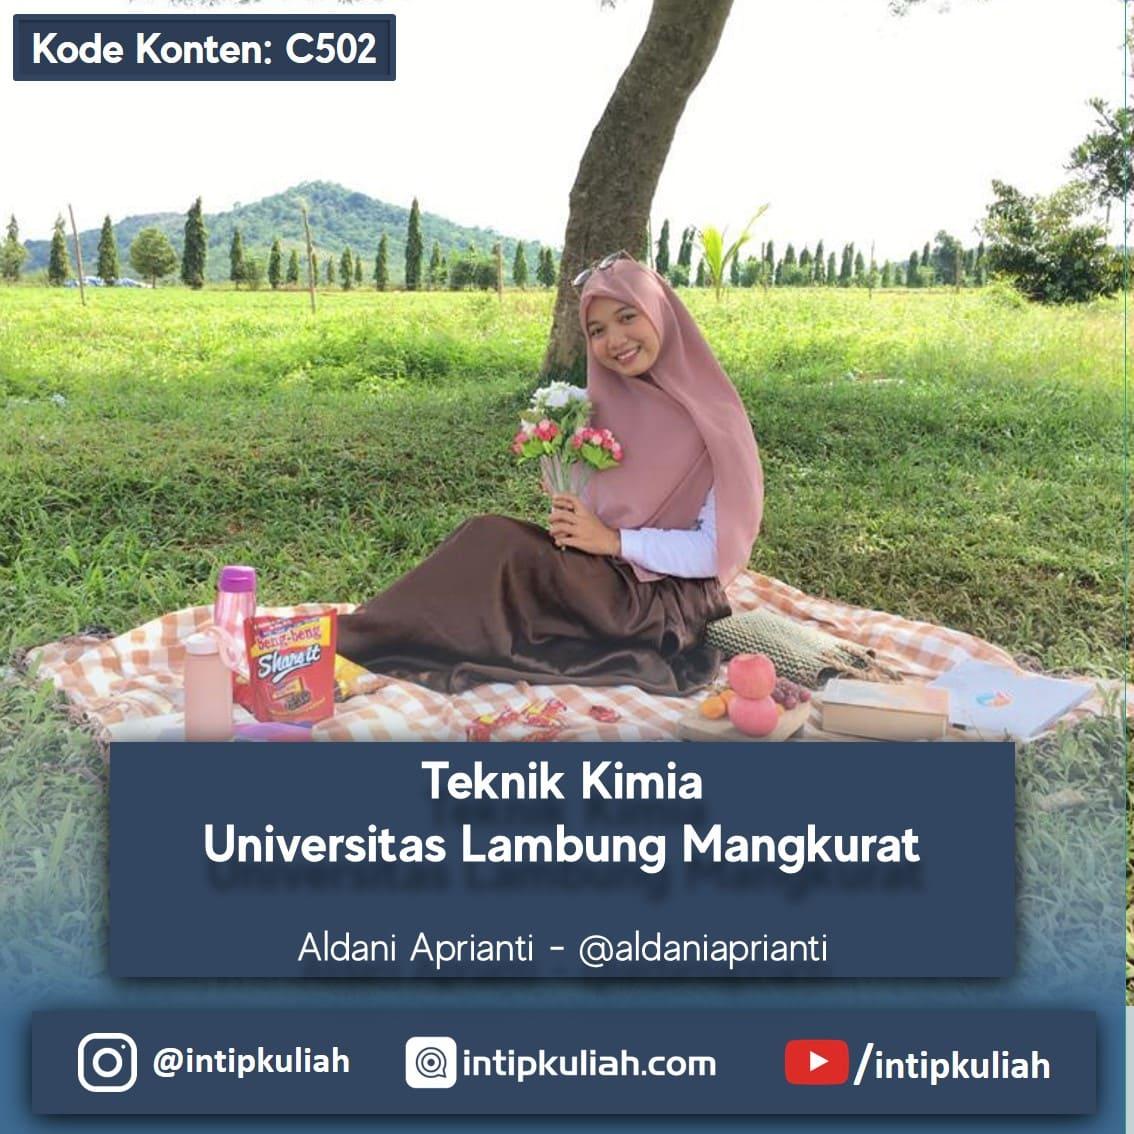 Teknik Kimia Universitas Lambung Mangkurat (Alda)